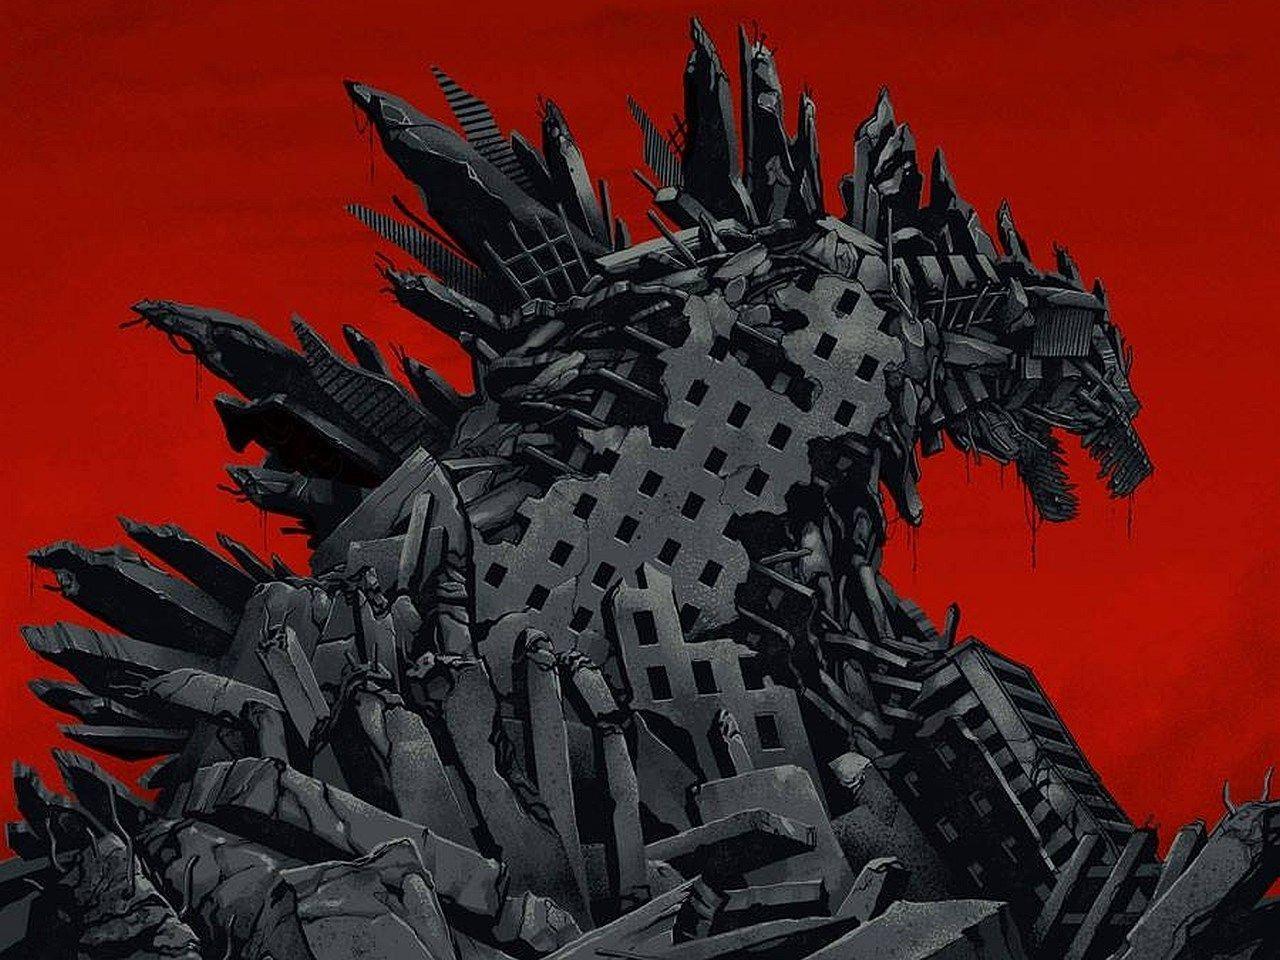 1280x960 Van Archibald - Backround Godzilla cho máy tính để bàn miễn phí - 1280x960 px